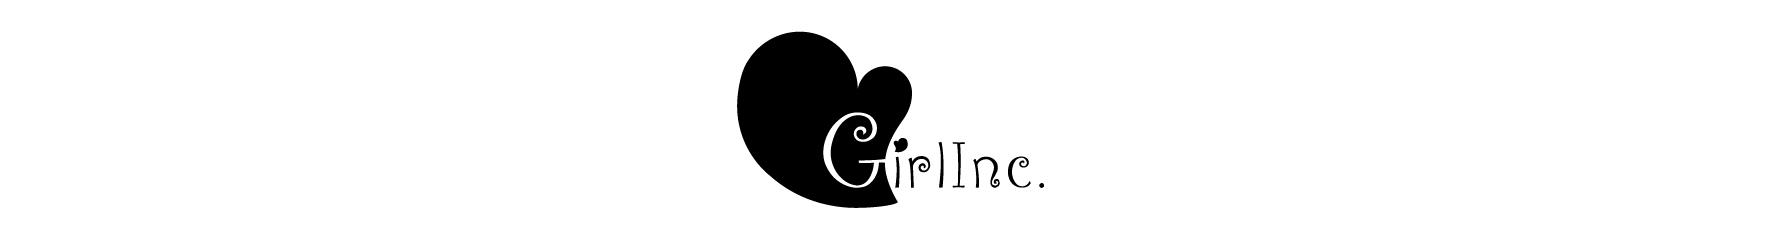 www.girlinc.com.cn